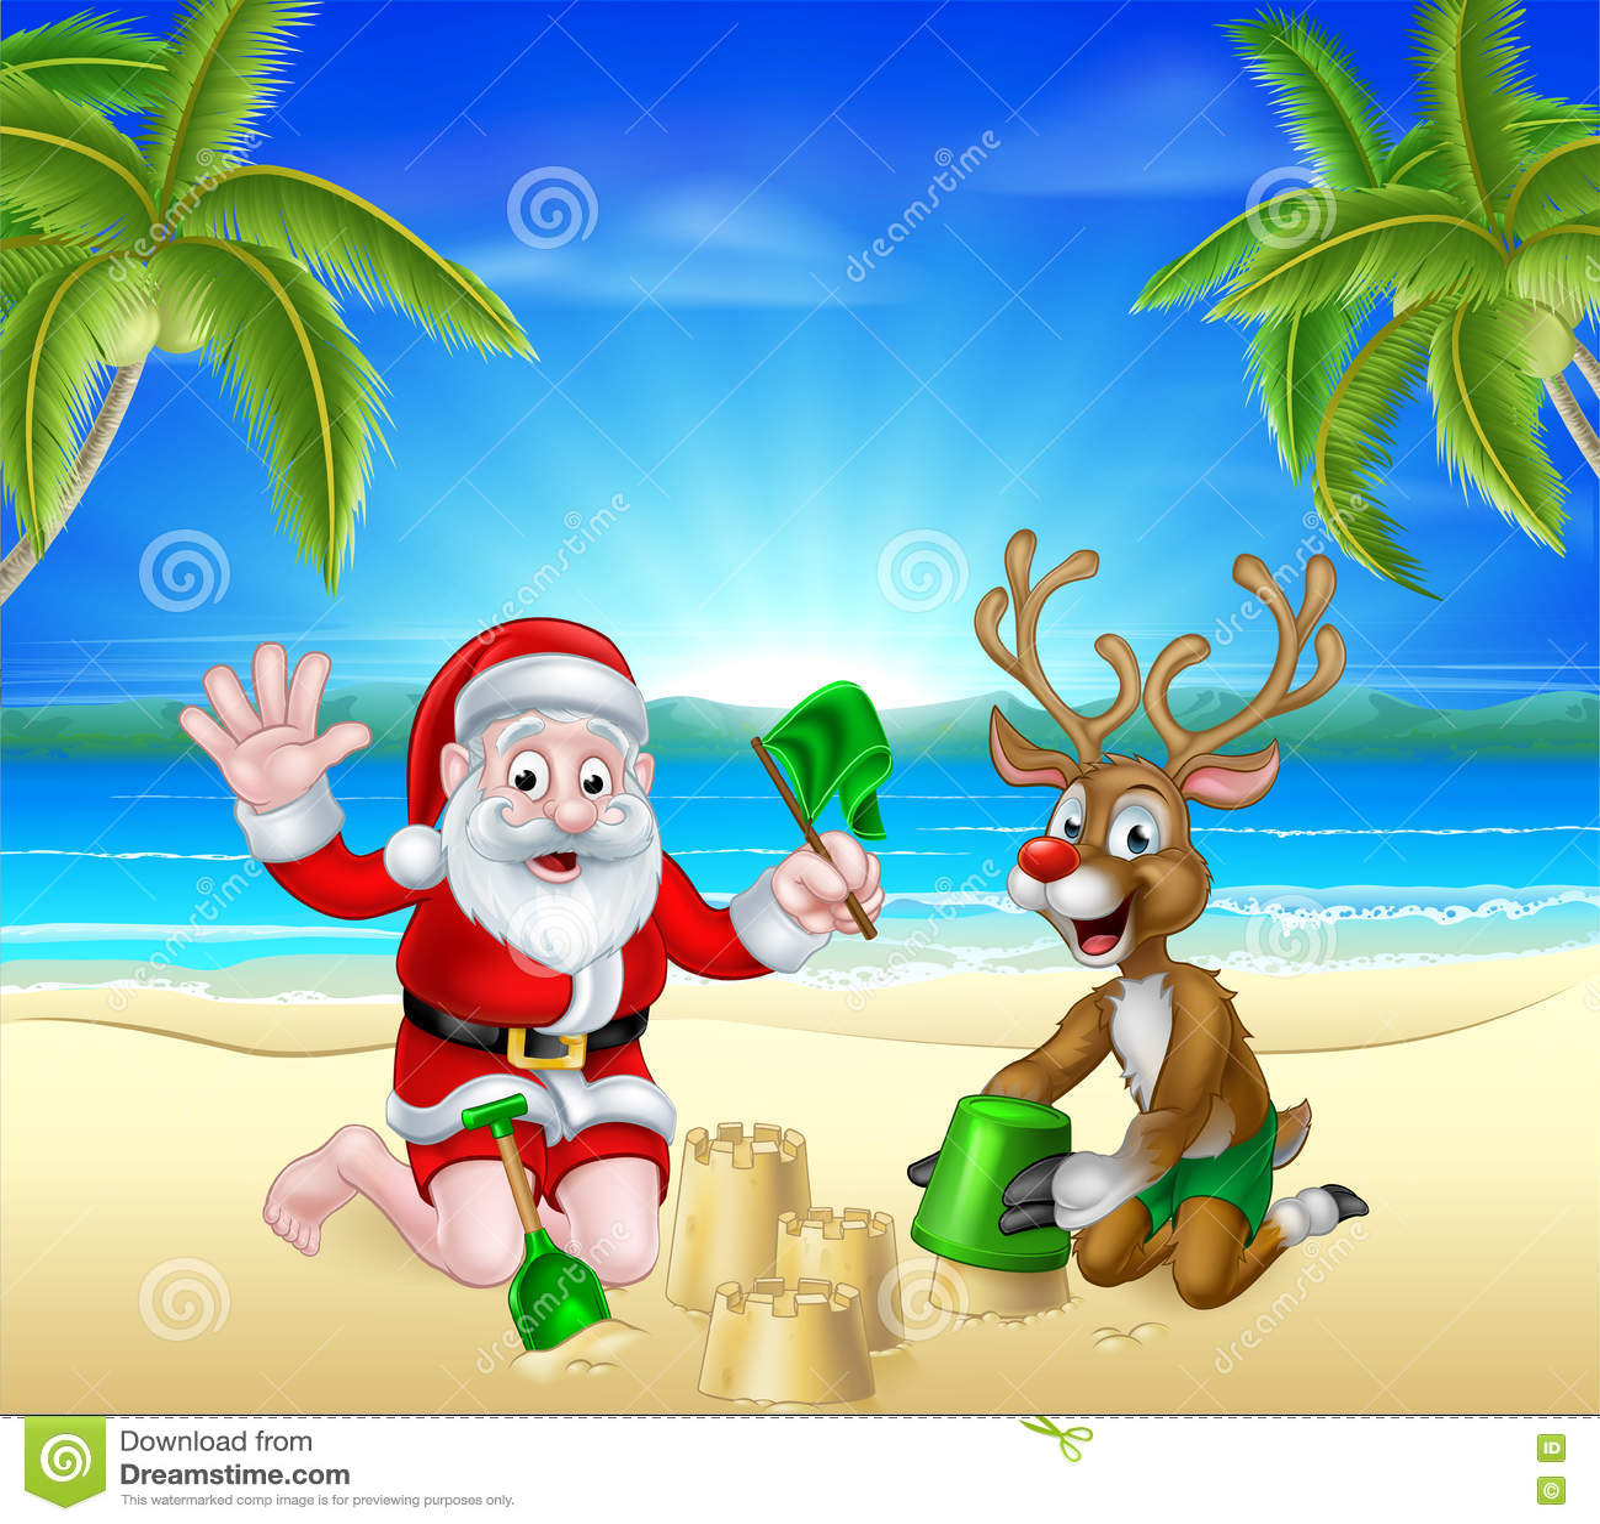 free clipart santa on the beach - photo #33